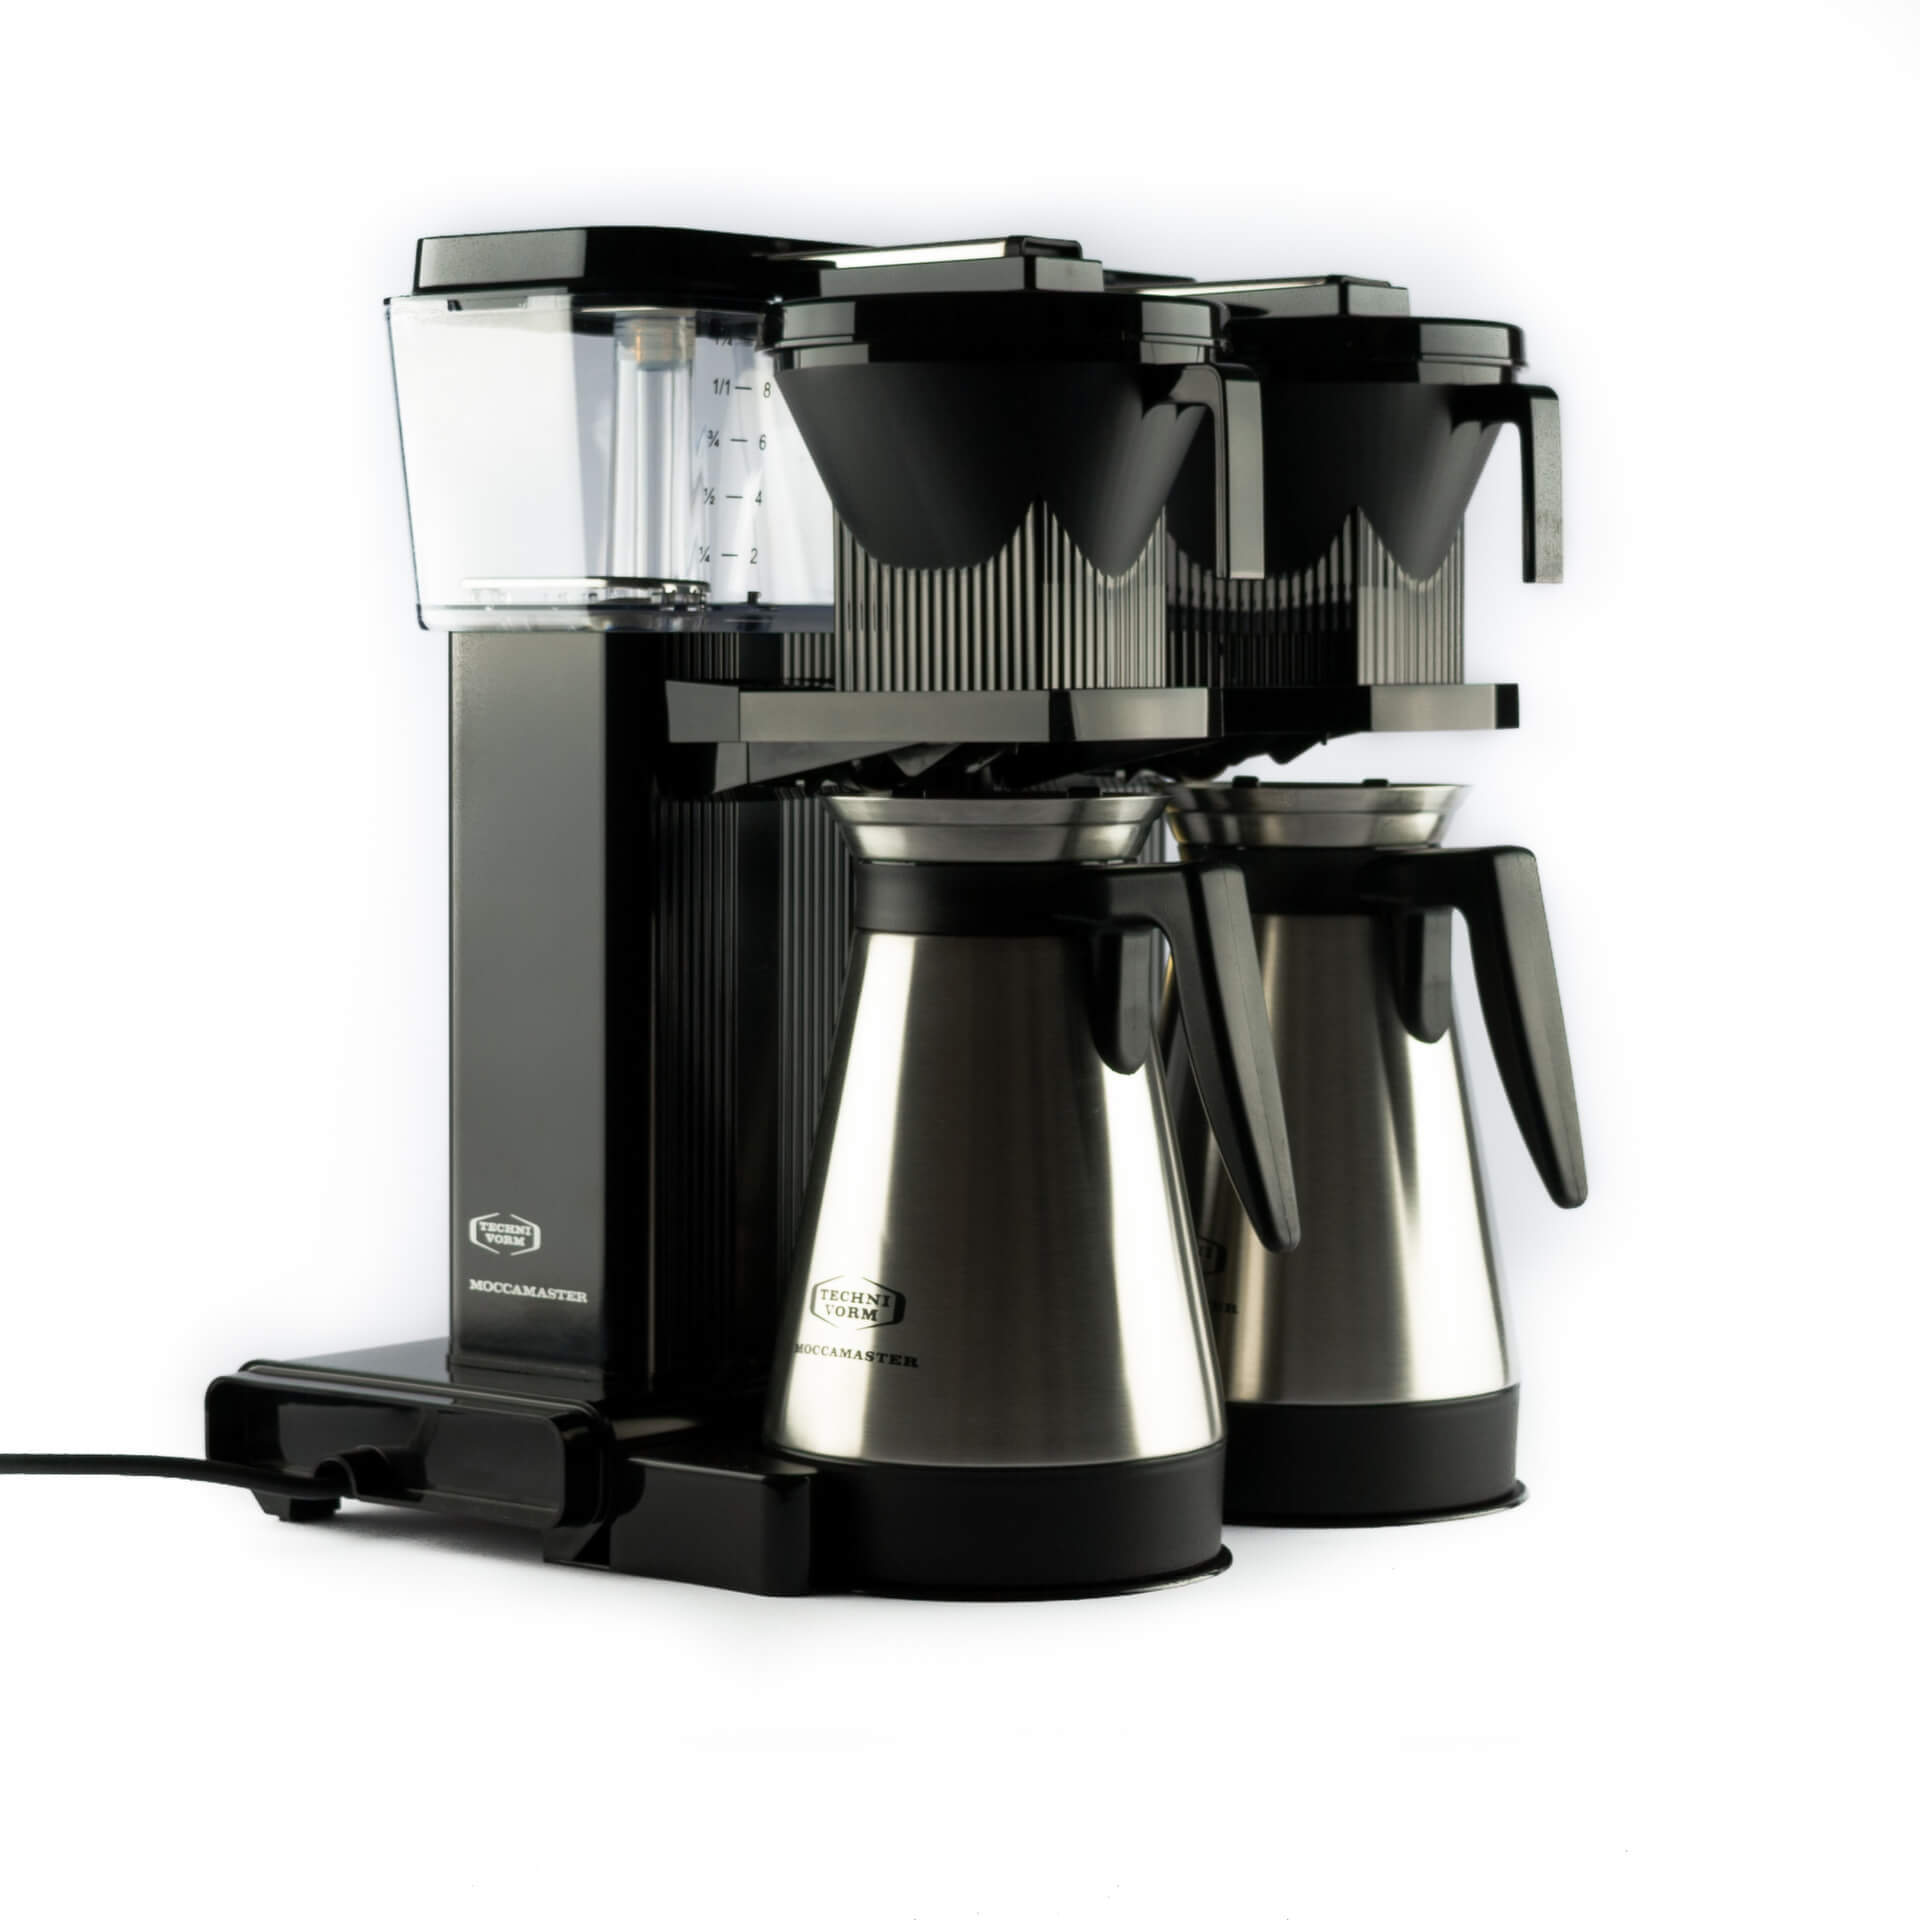 Moccamaster Kaffeeautomat KBGT20 - entry.title | Kamasega